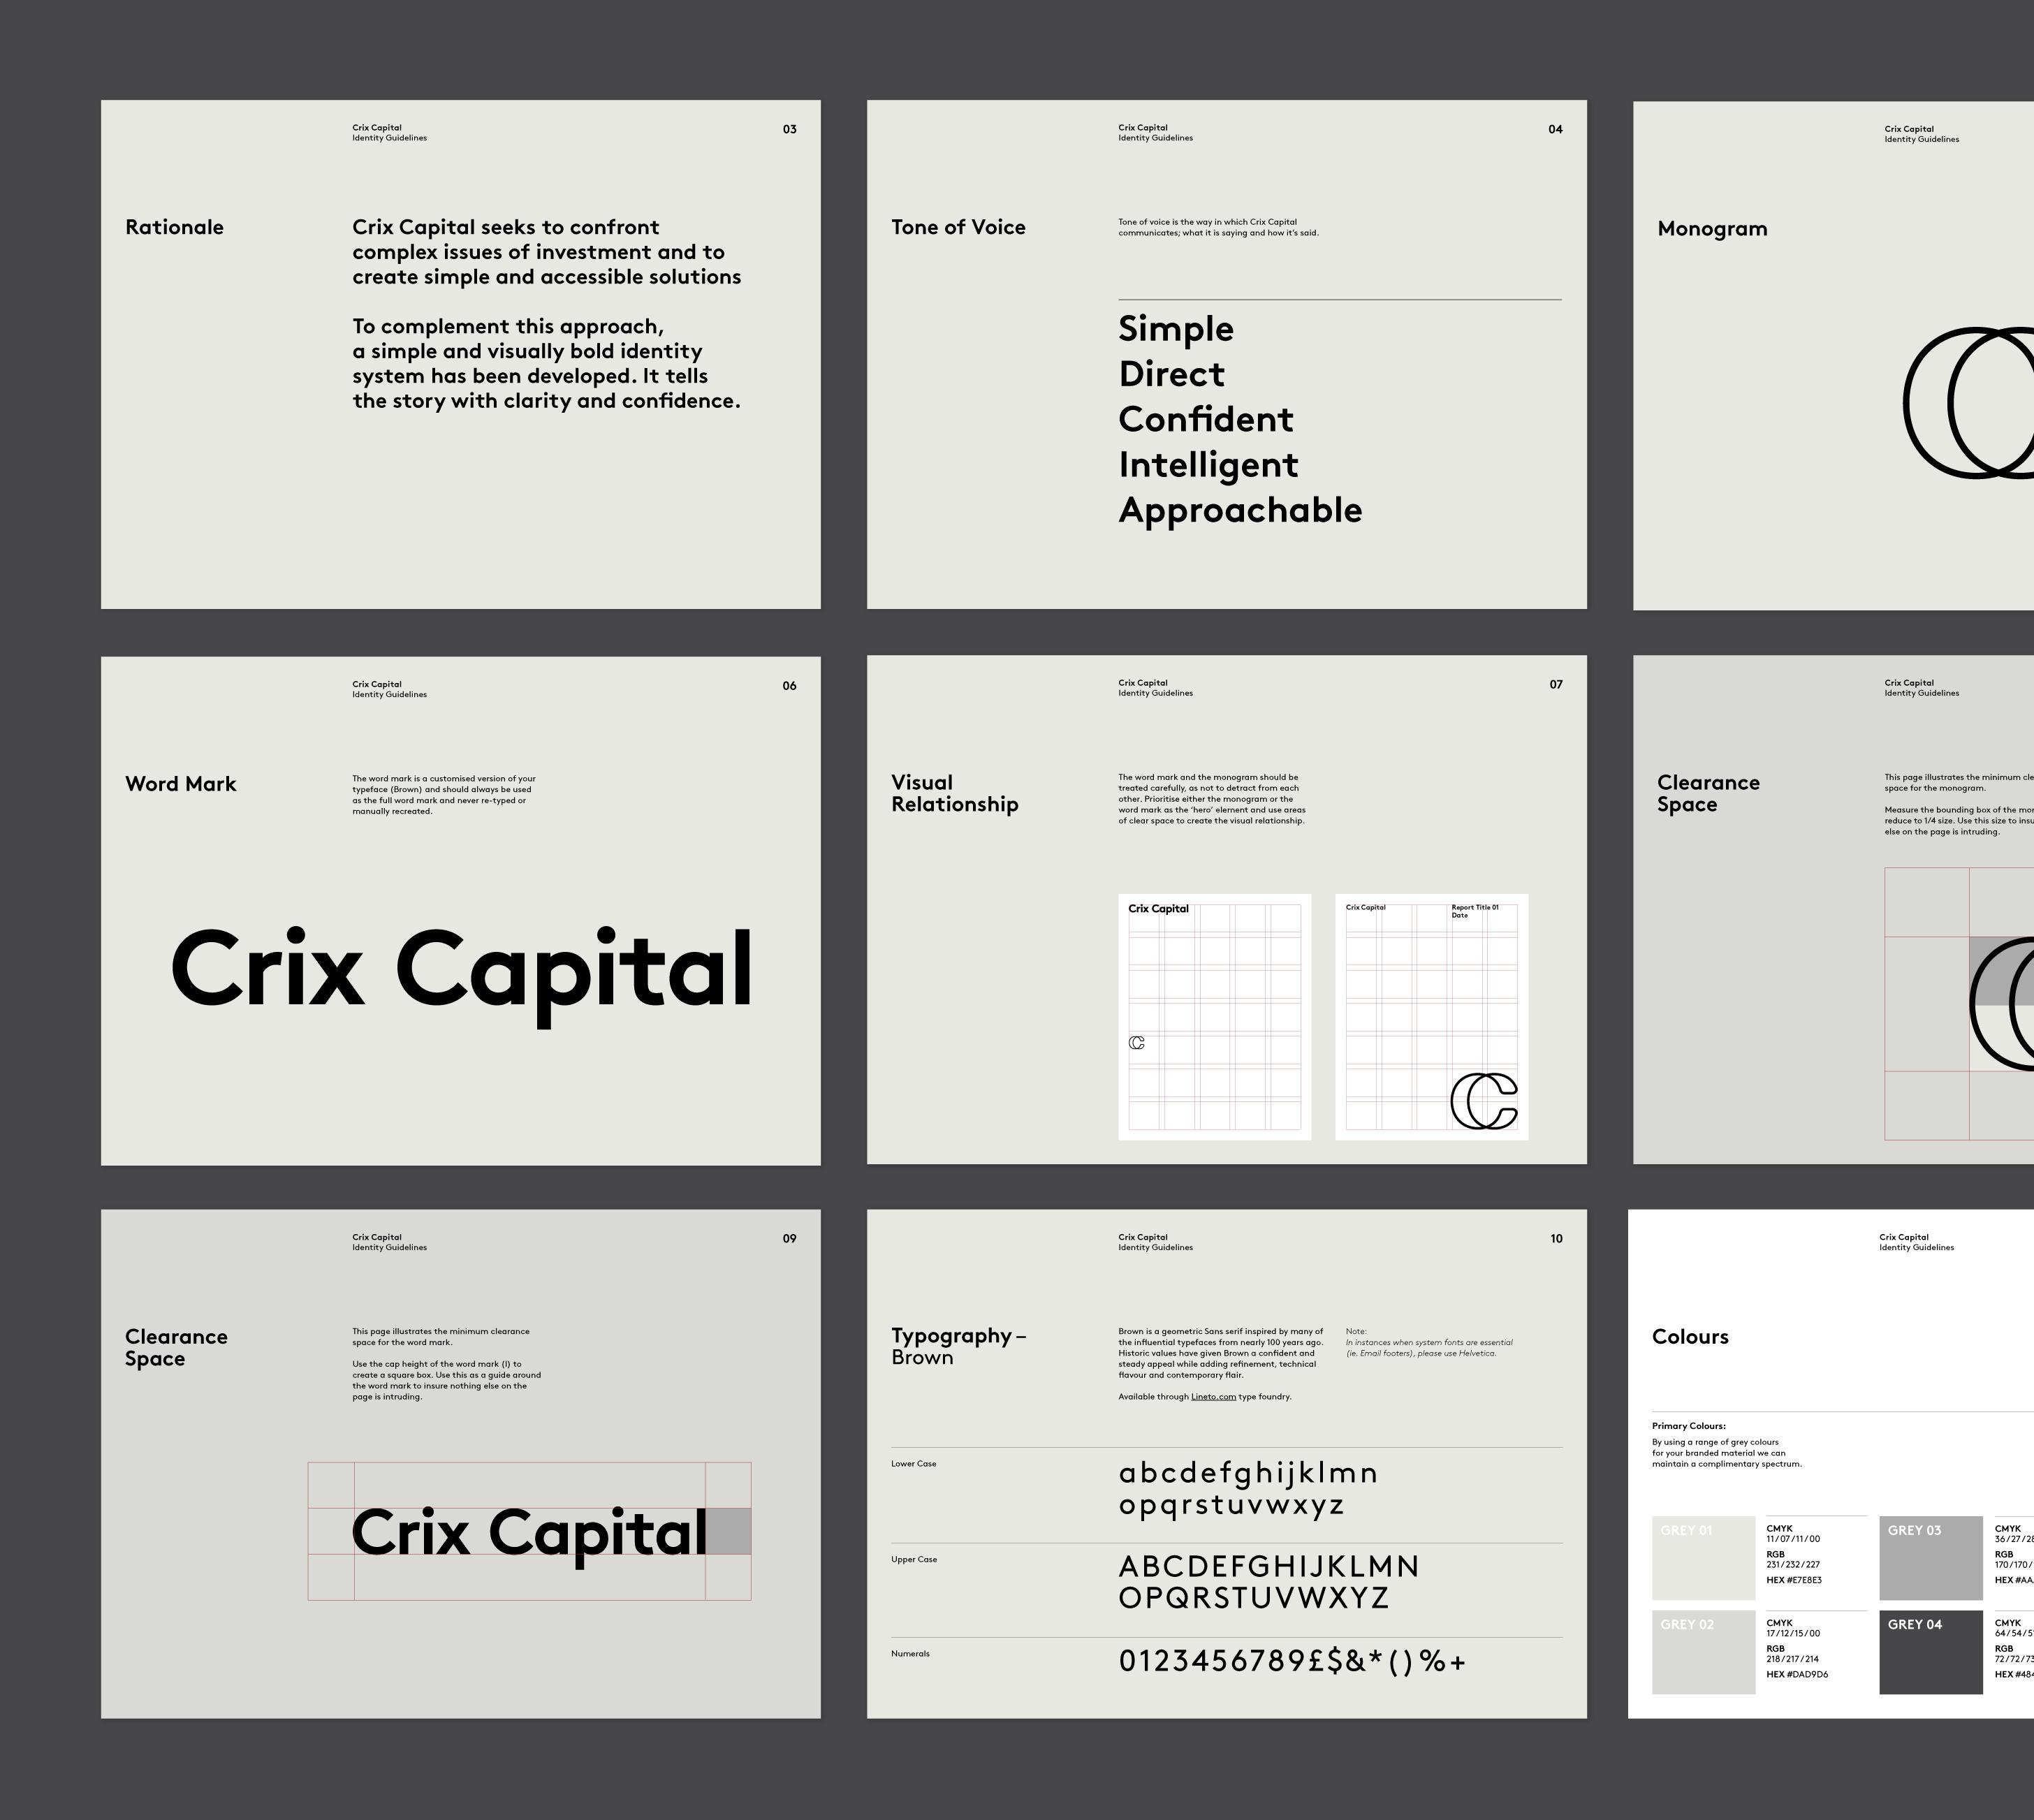 brand-guidelines-crix-capital-london